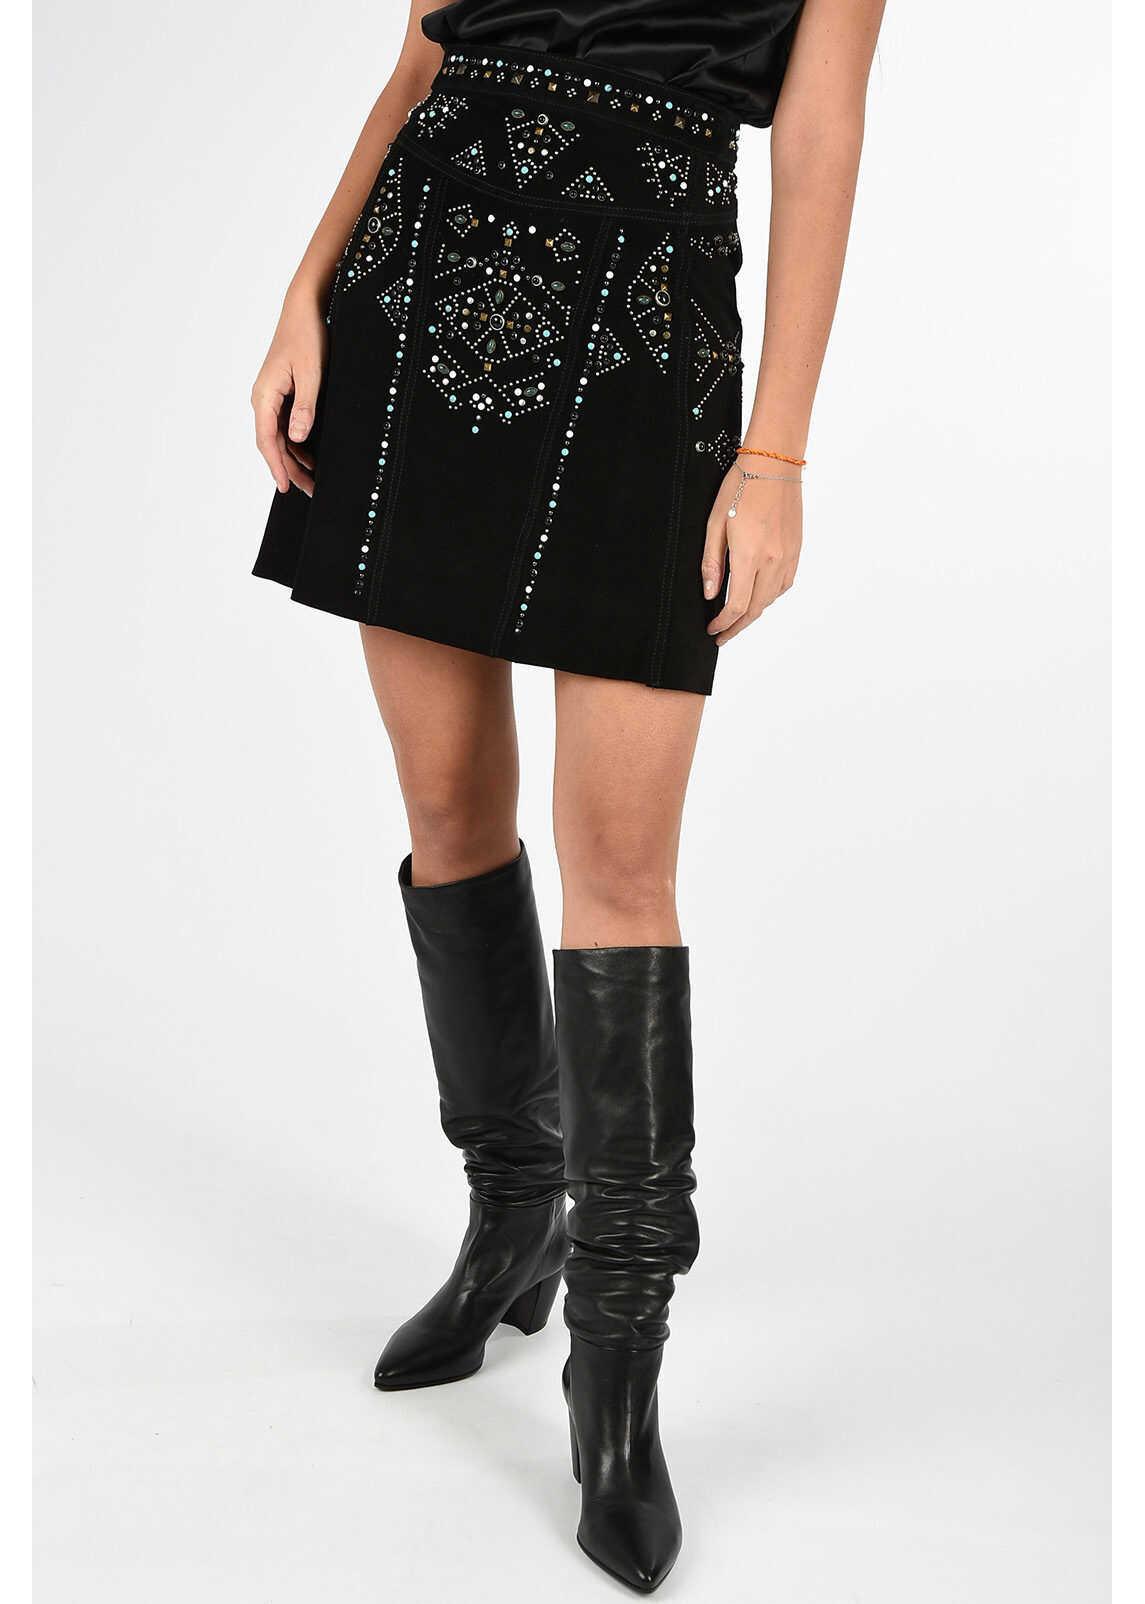 BLACK GOLD Studded OBORC Skirt thumbnail